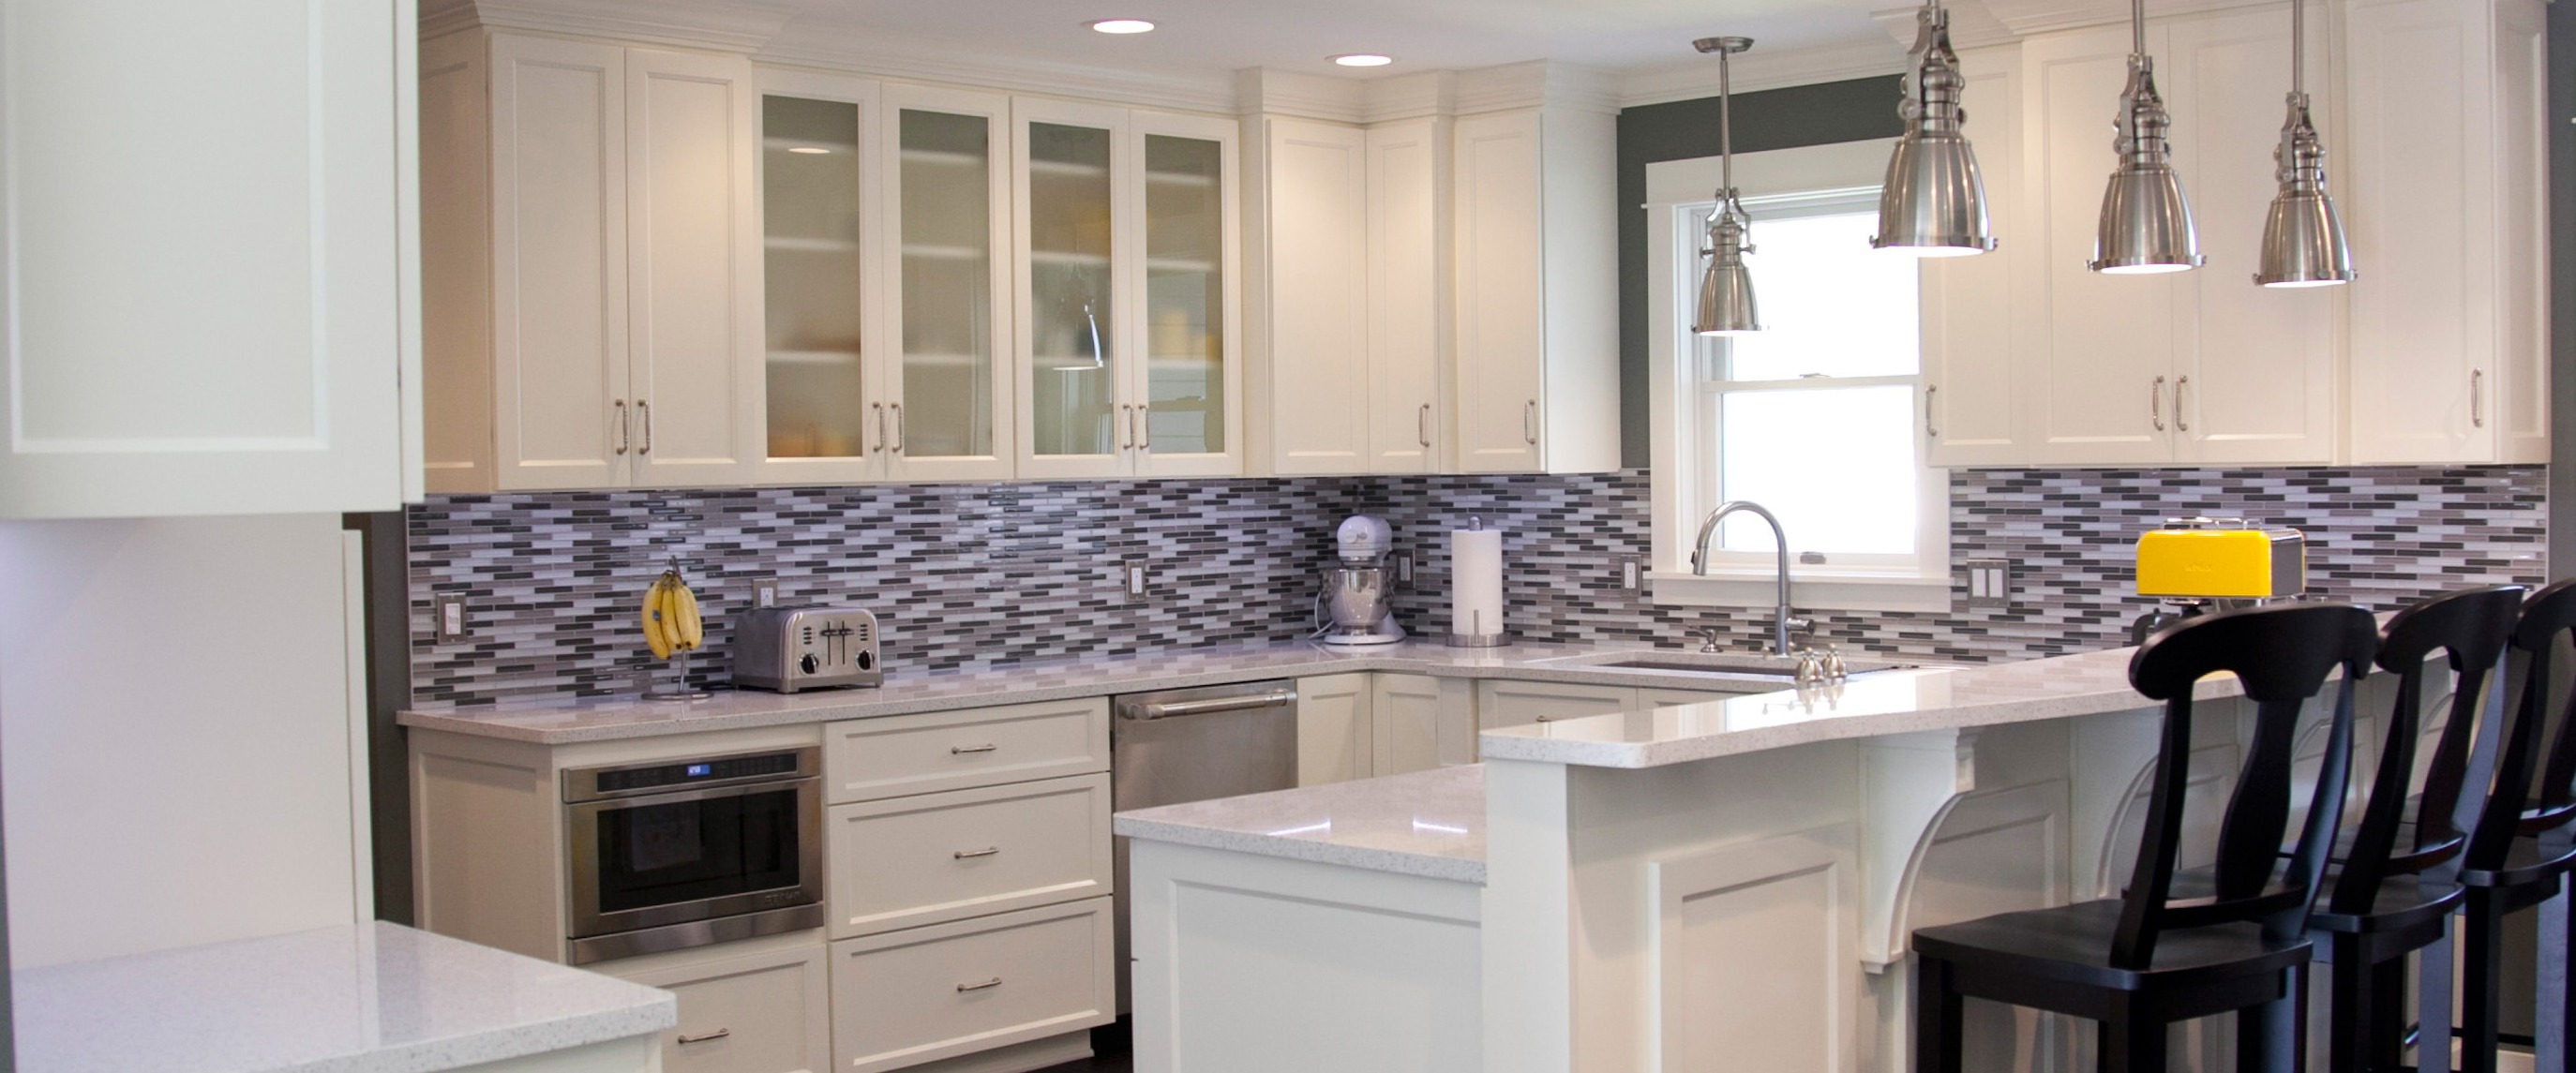 Bayer Kitchen Cabinets